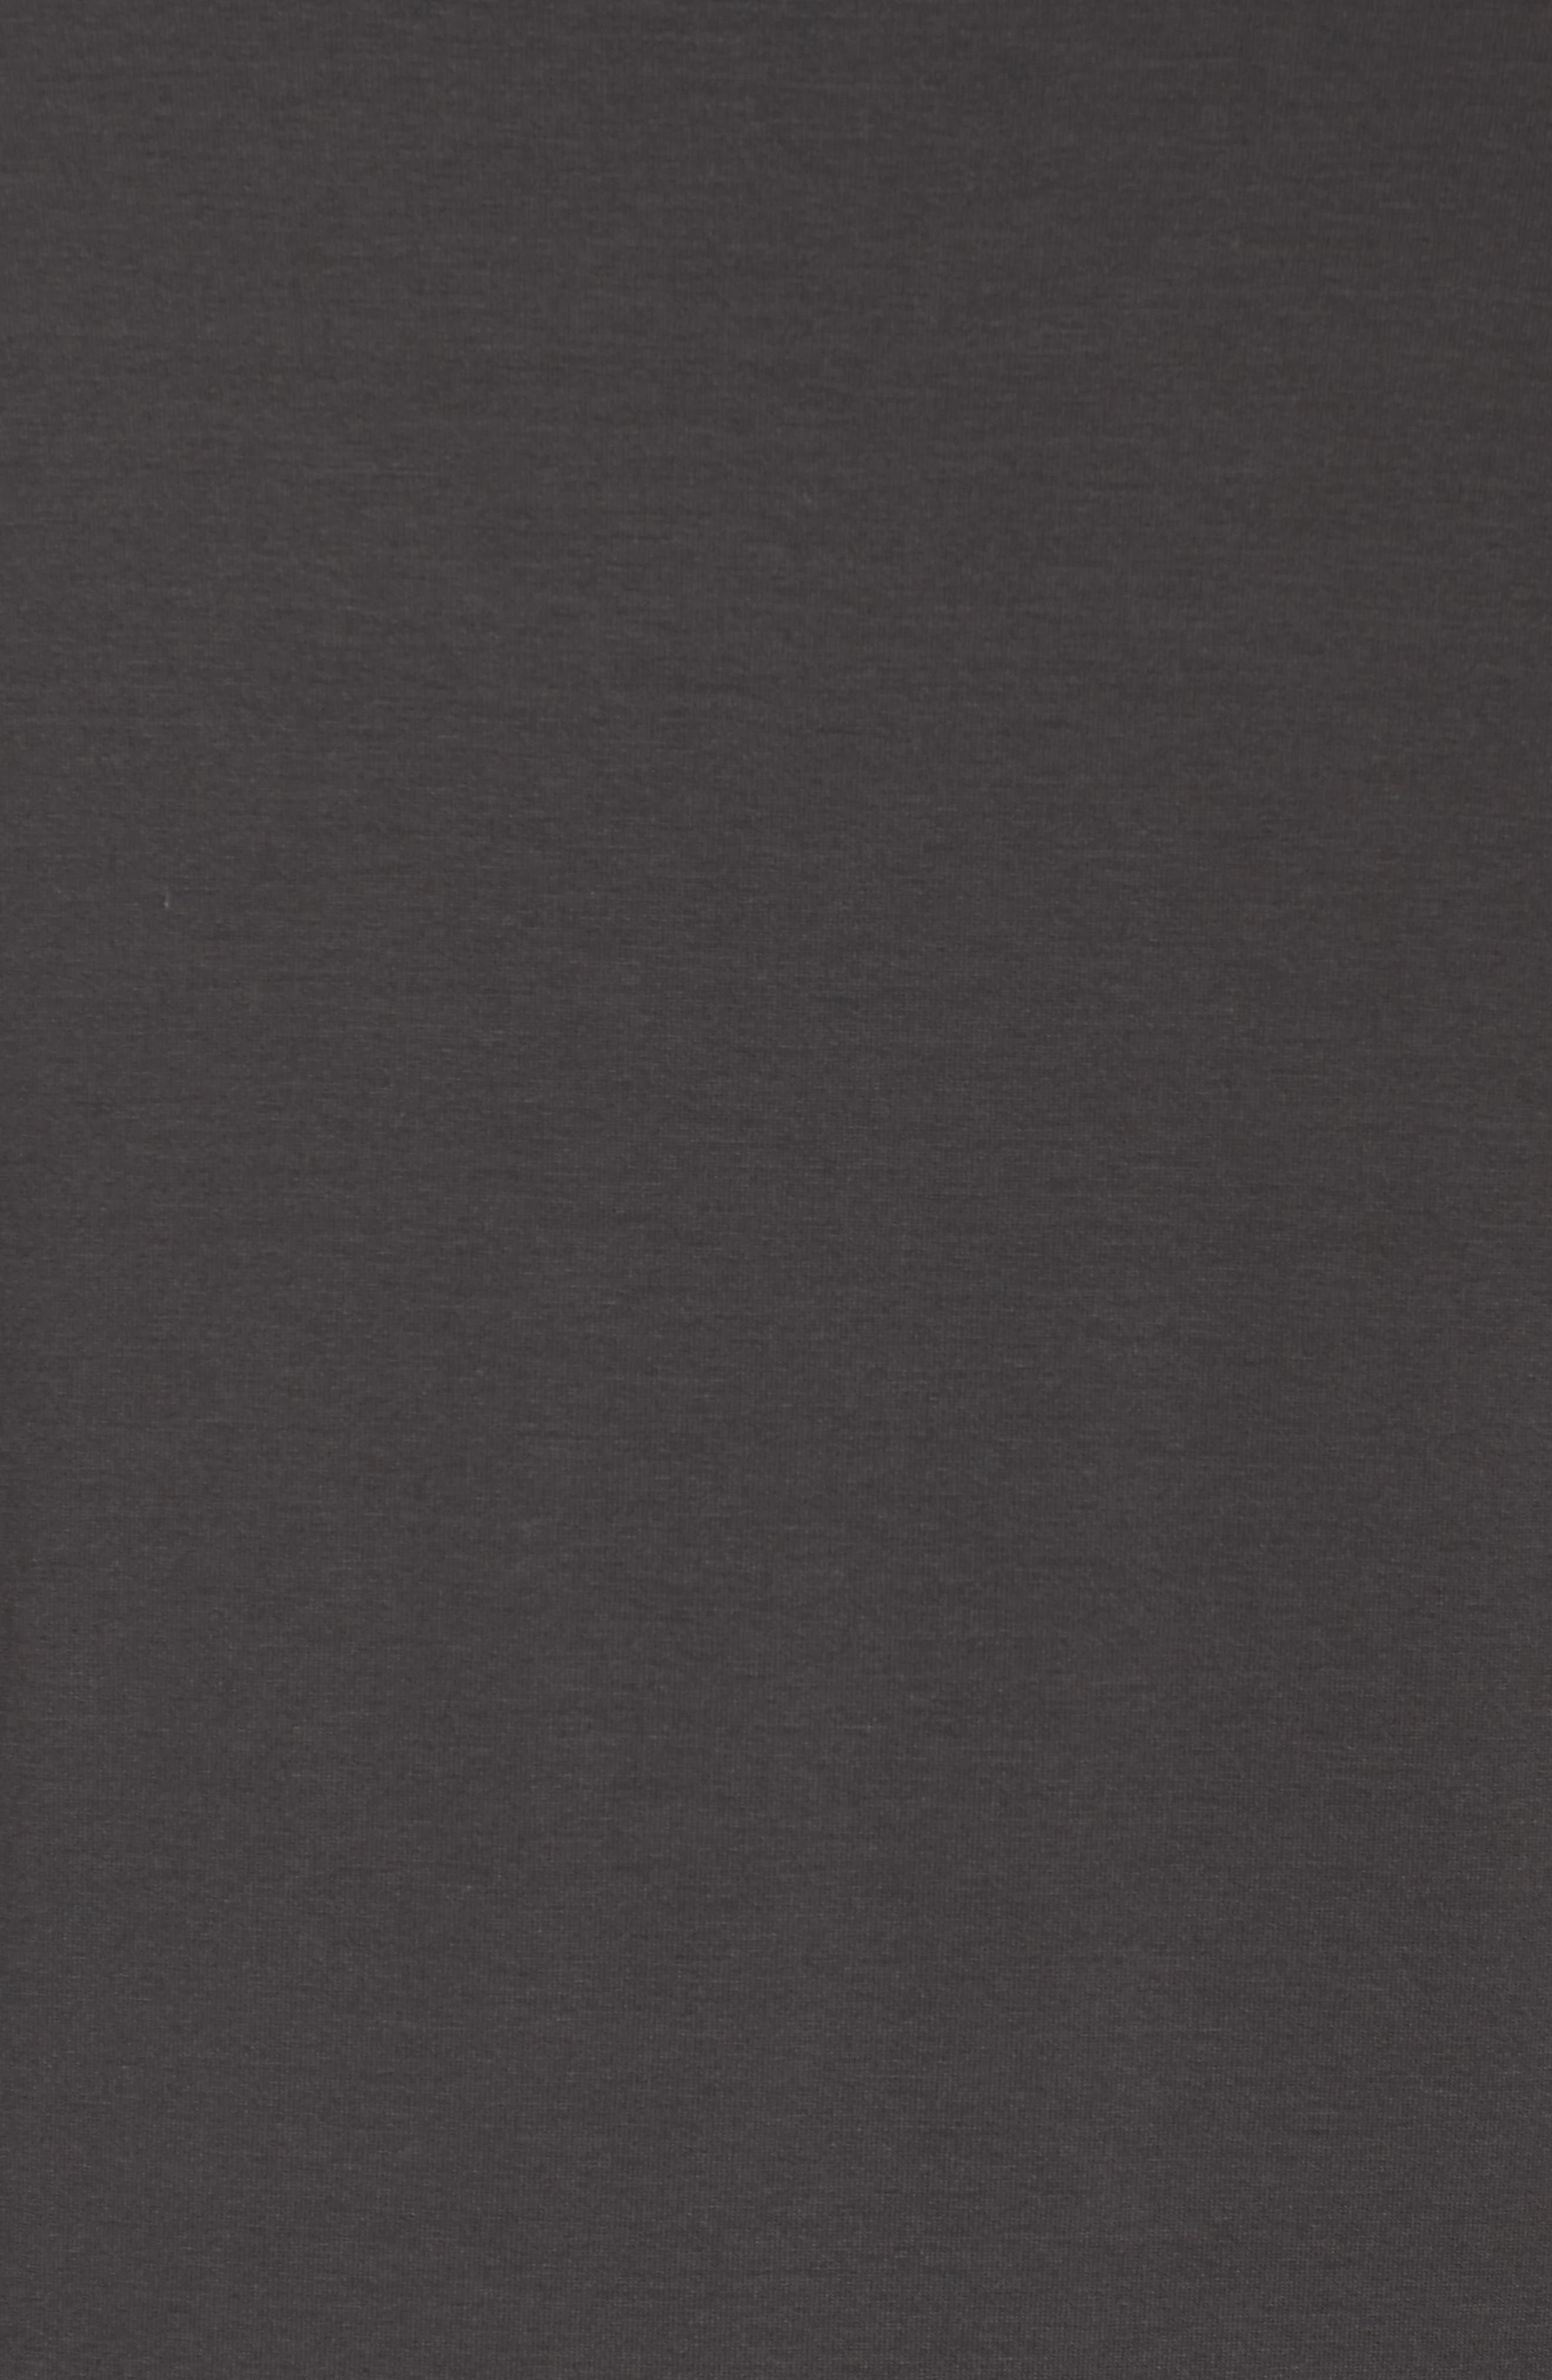 Scoop Neck Jersey Dress,                             Alternate thumbnail 5, color,                             025